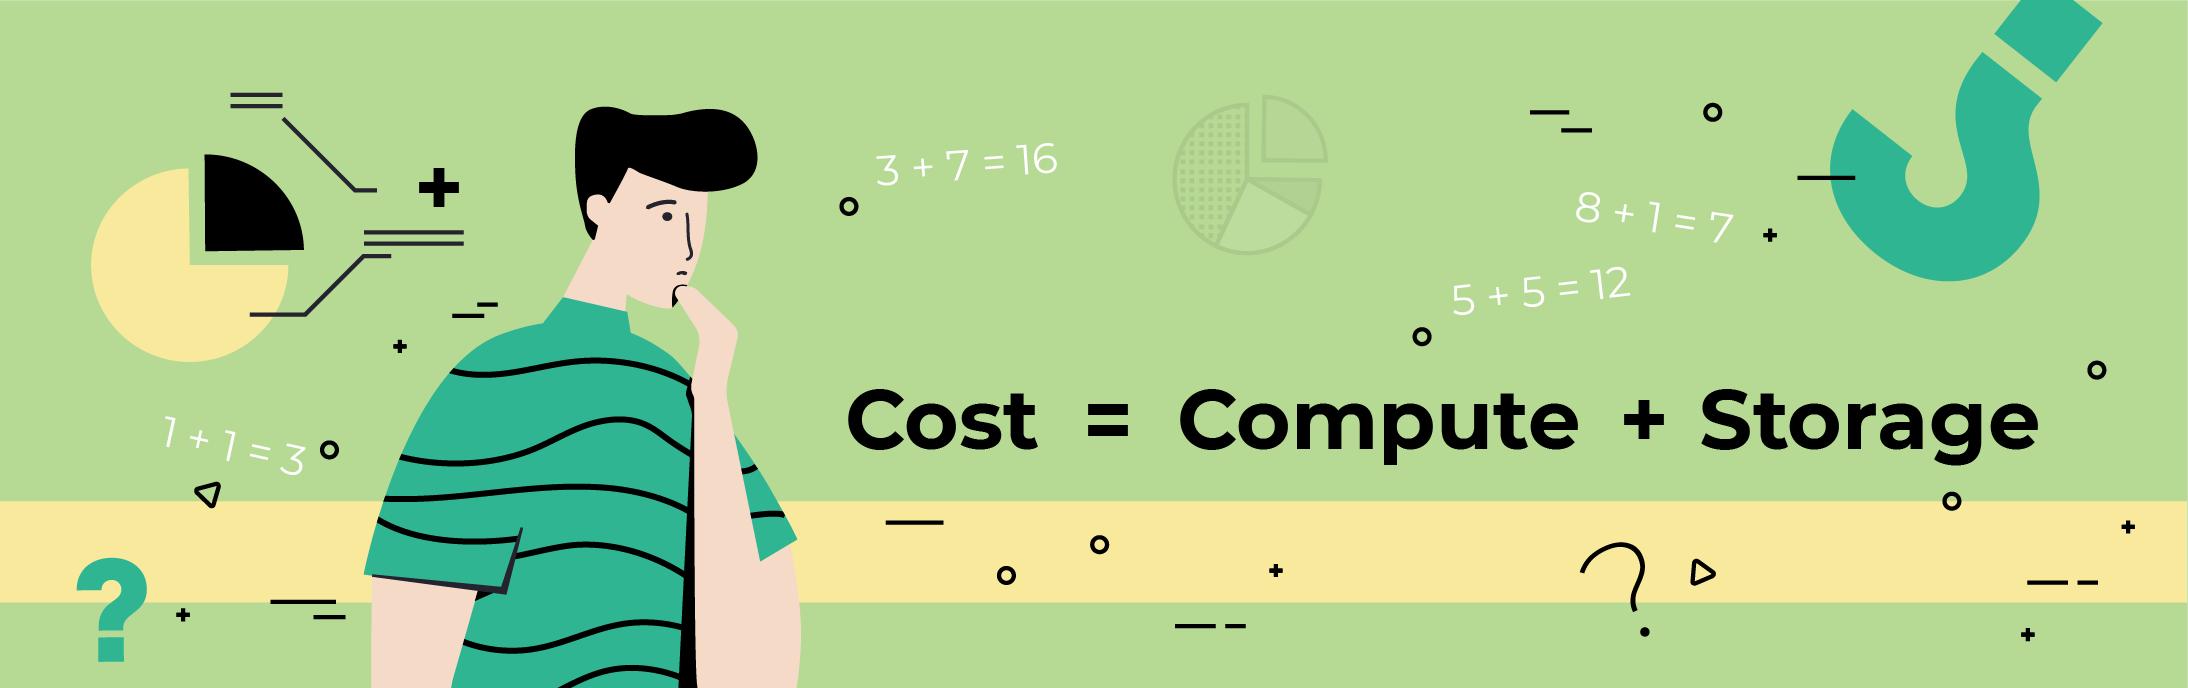 cost-compute-storage